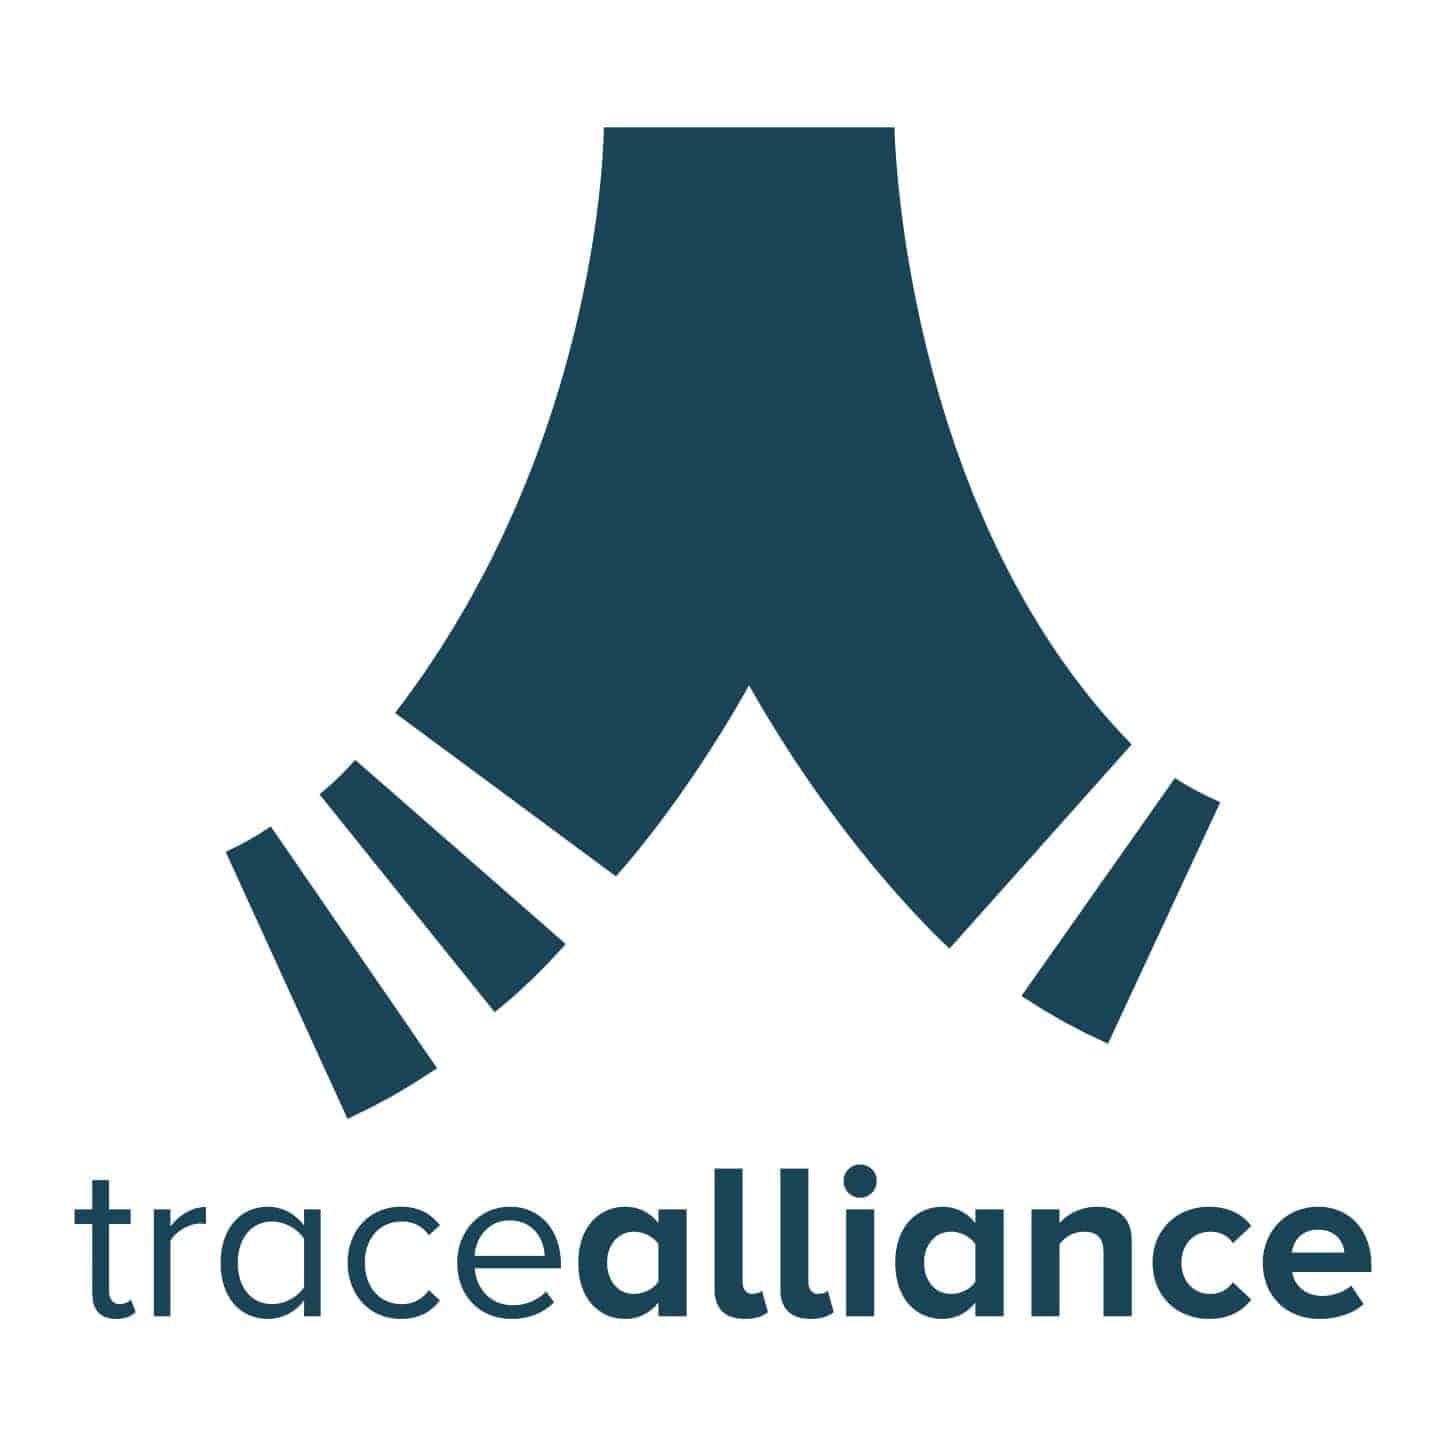 trace-alliance logo